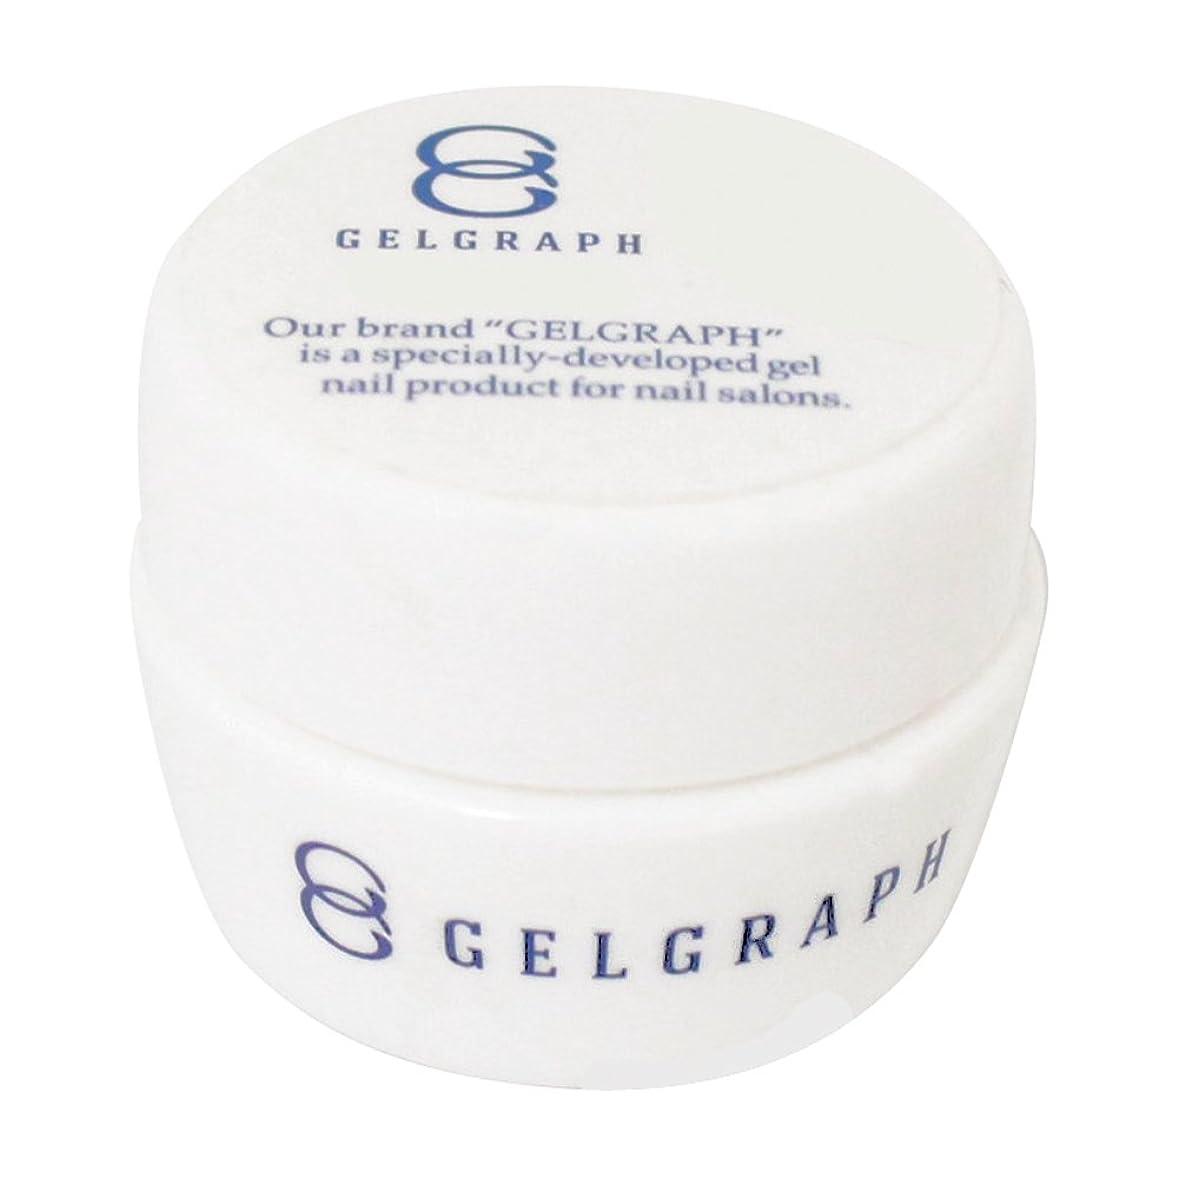 GELGRAPH カラージェル 092M ランべスレモネード 5g UV/LED対応 ソークオフジェル